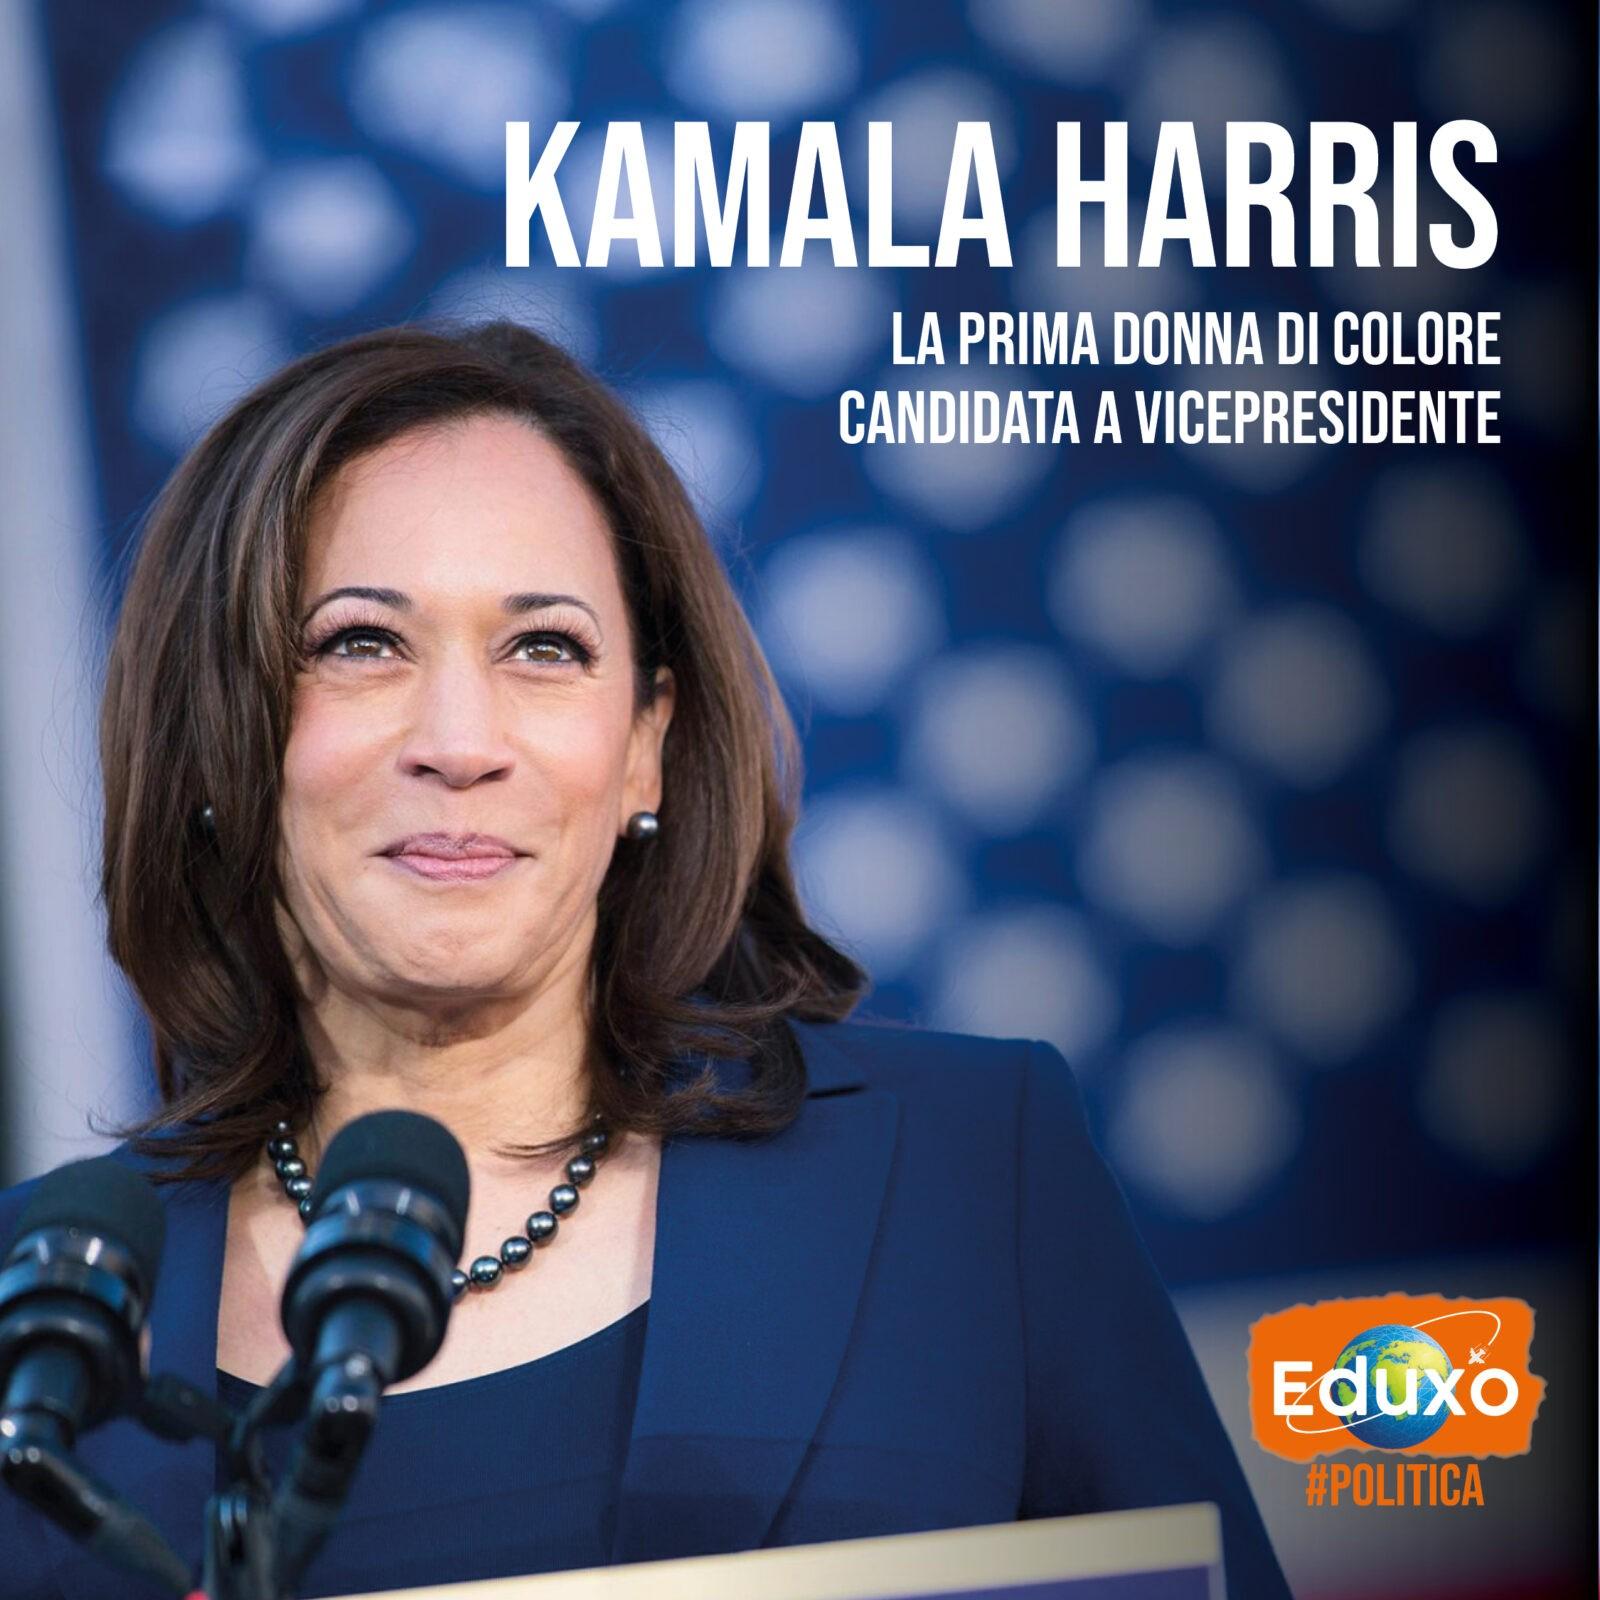 You are currently viewing Kamala Harris: la prima donna nera ad essere candidata Vicepresidente